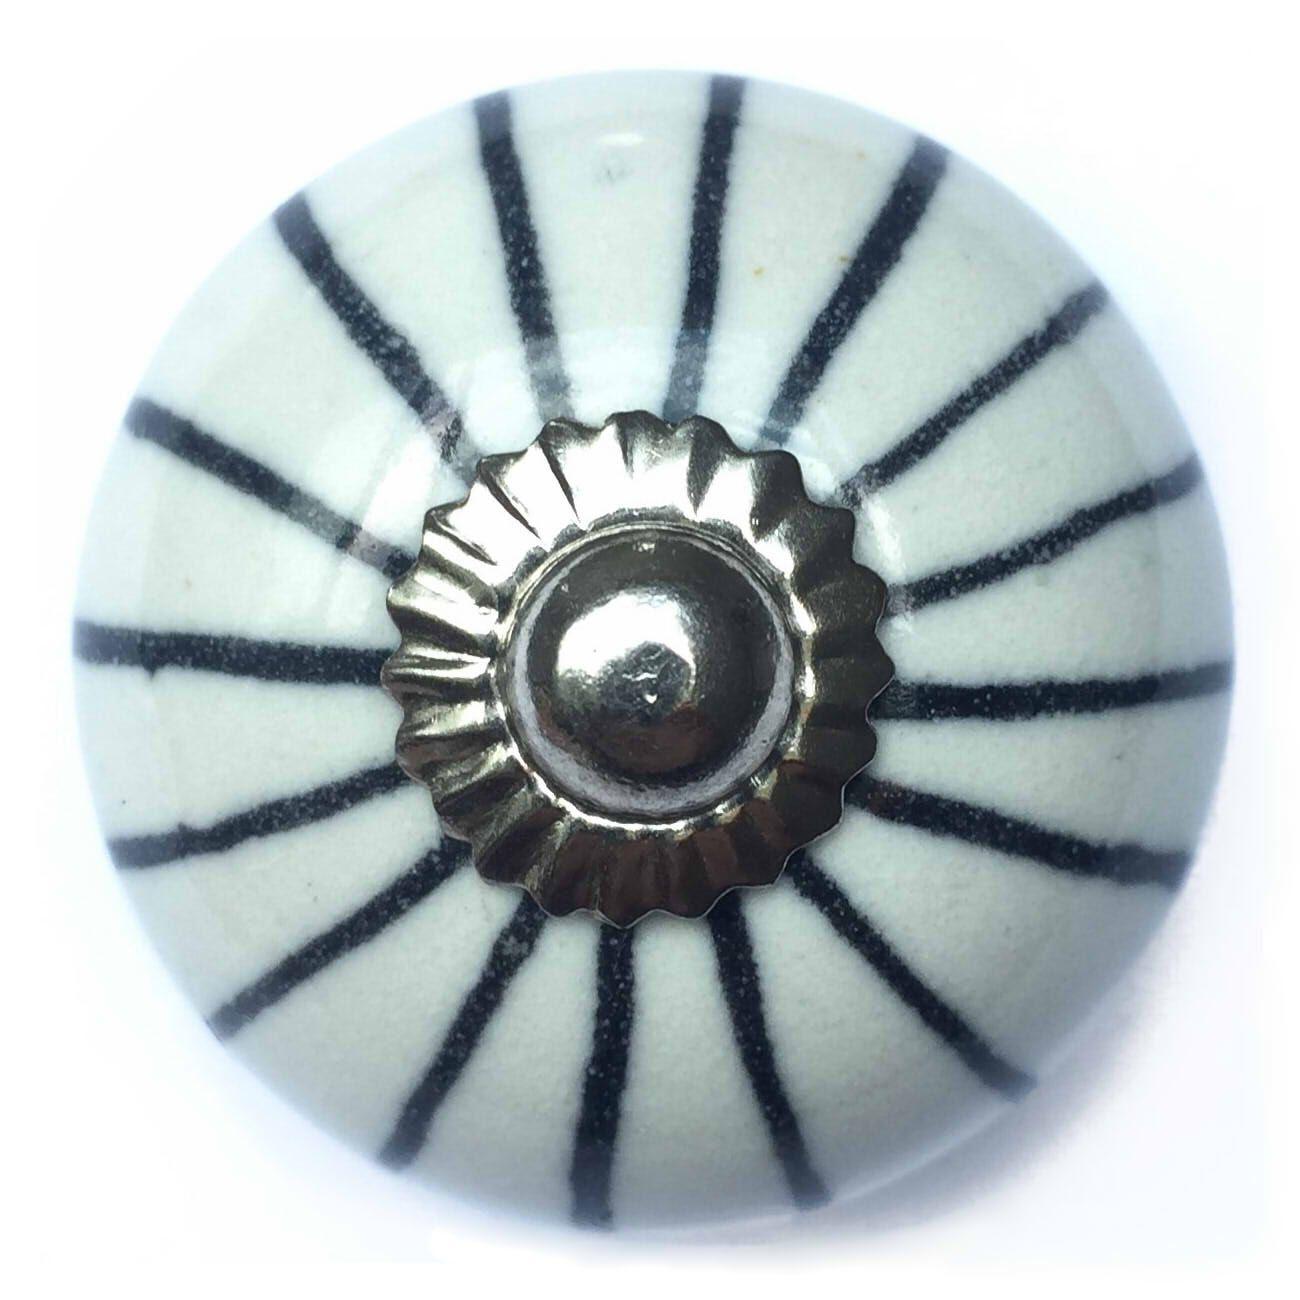 Puxador de Porcelana Malu Preto e Branco